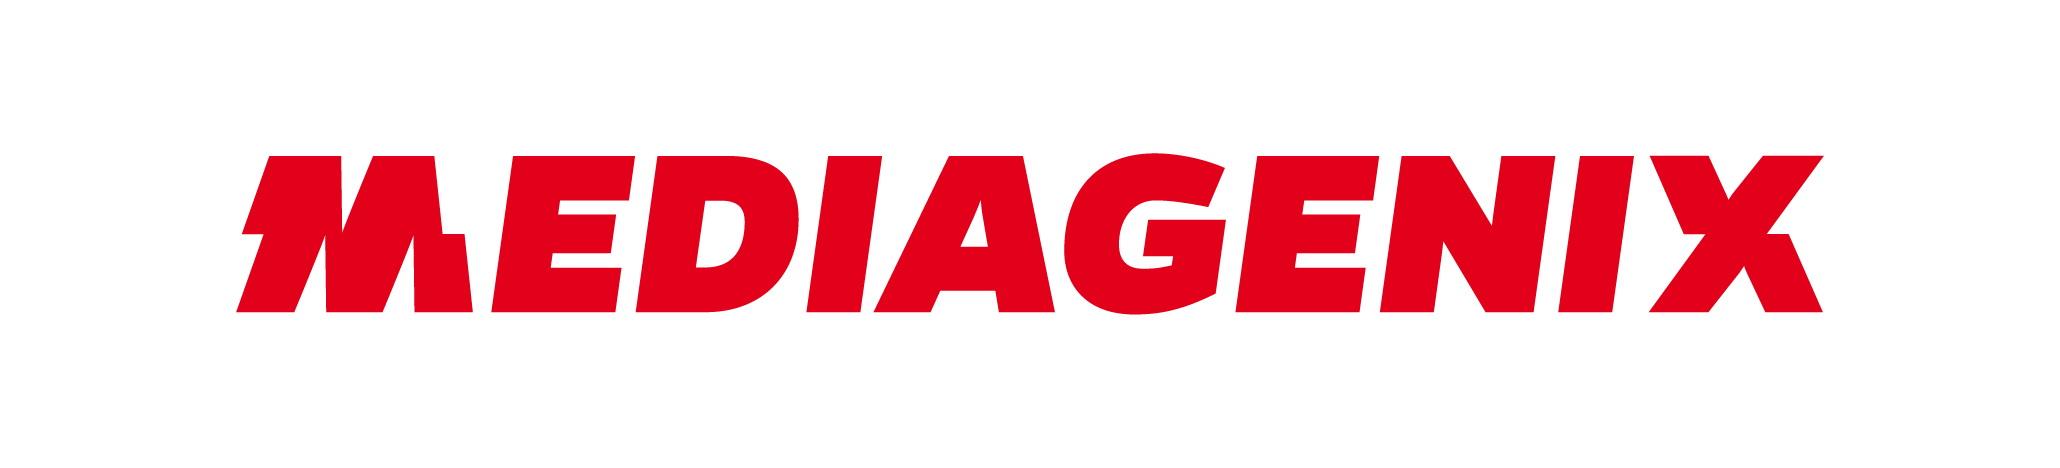 File:Mediagenix logo klein.jpg